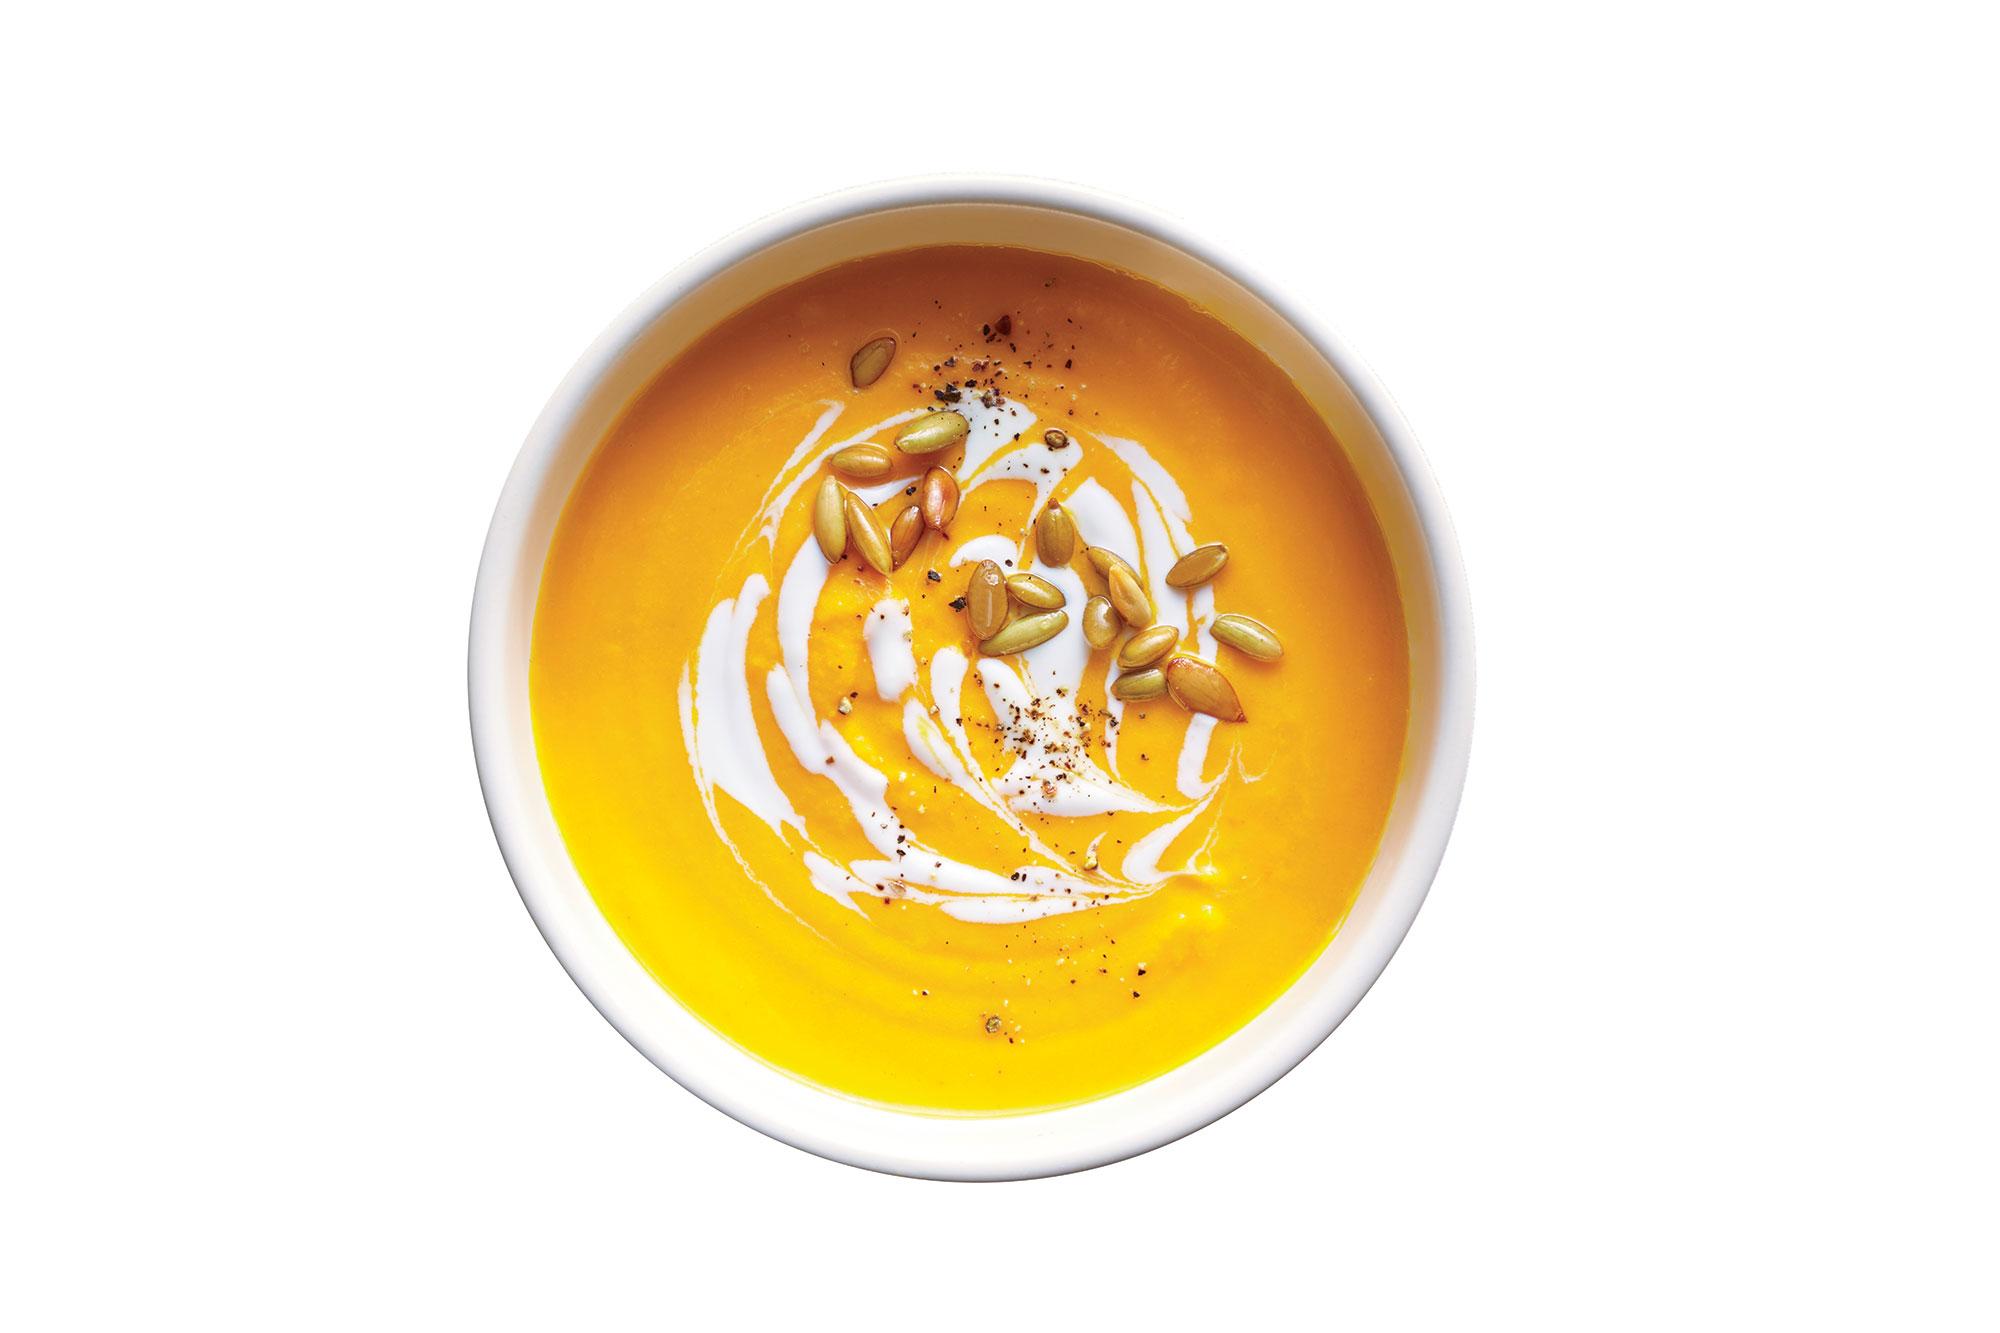 Creamy Carrot and Lemongrass Soup